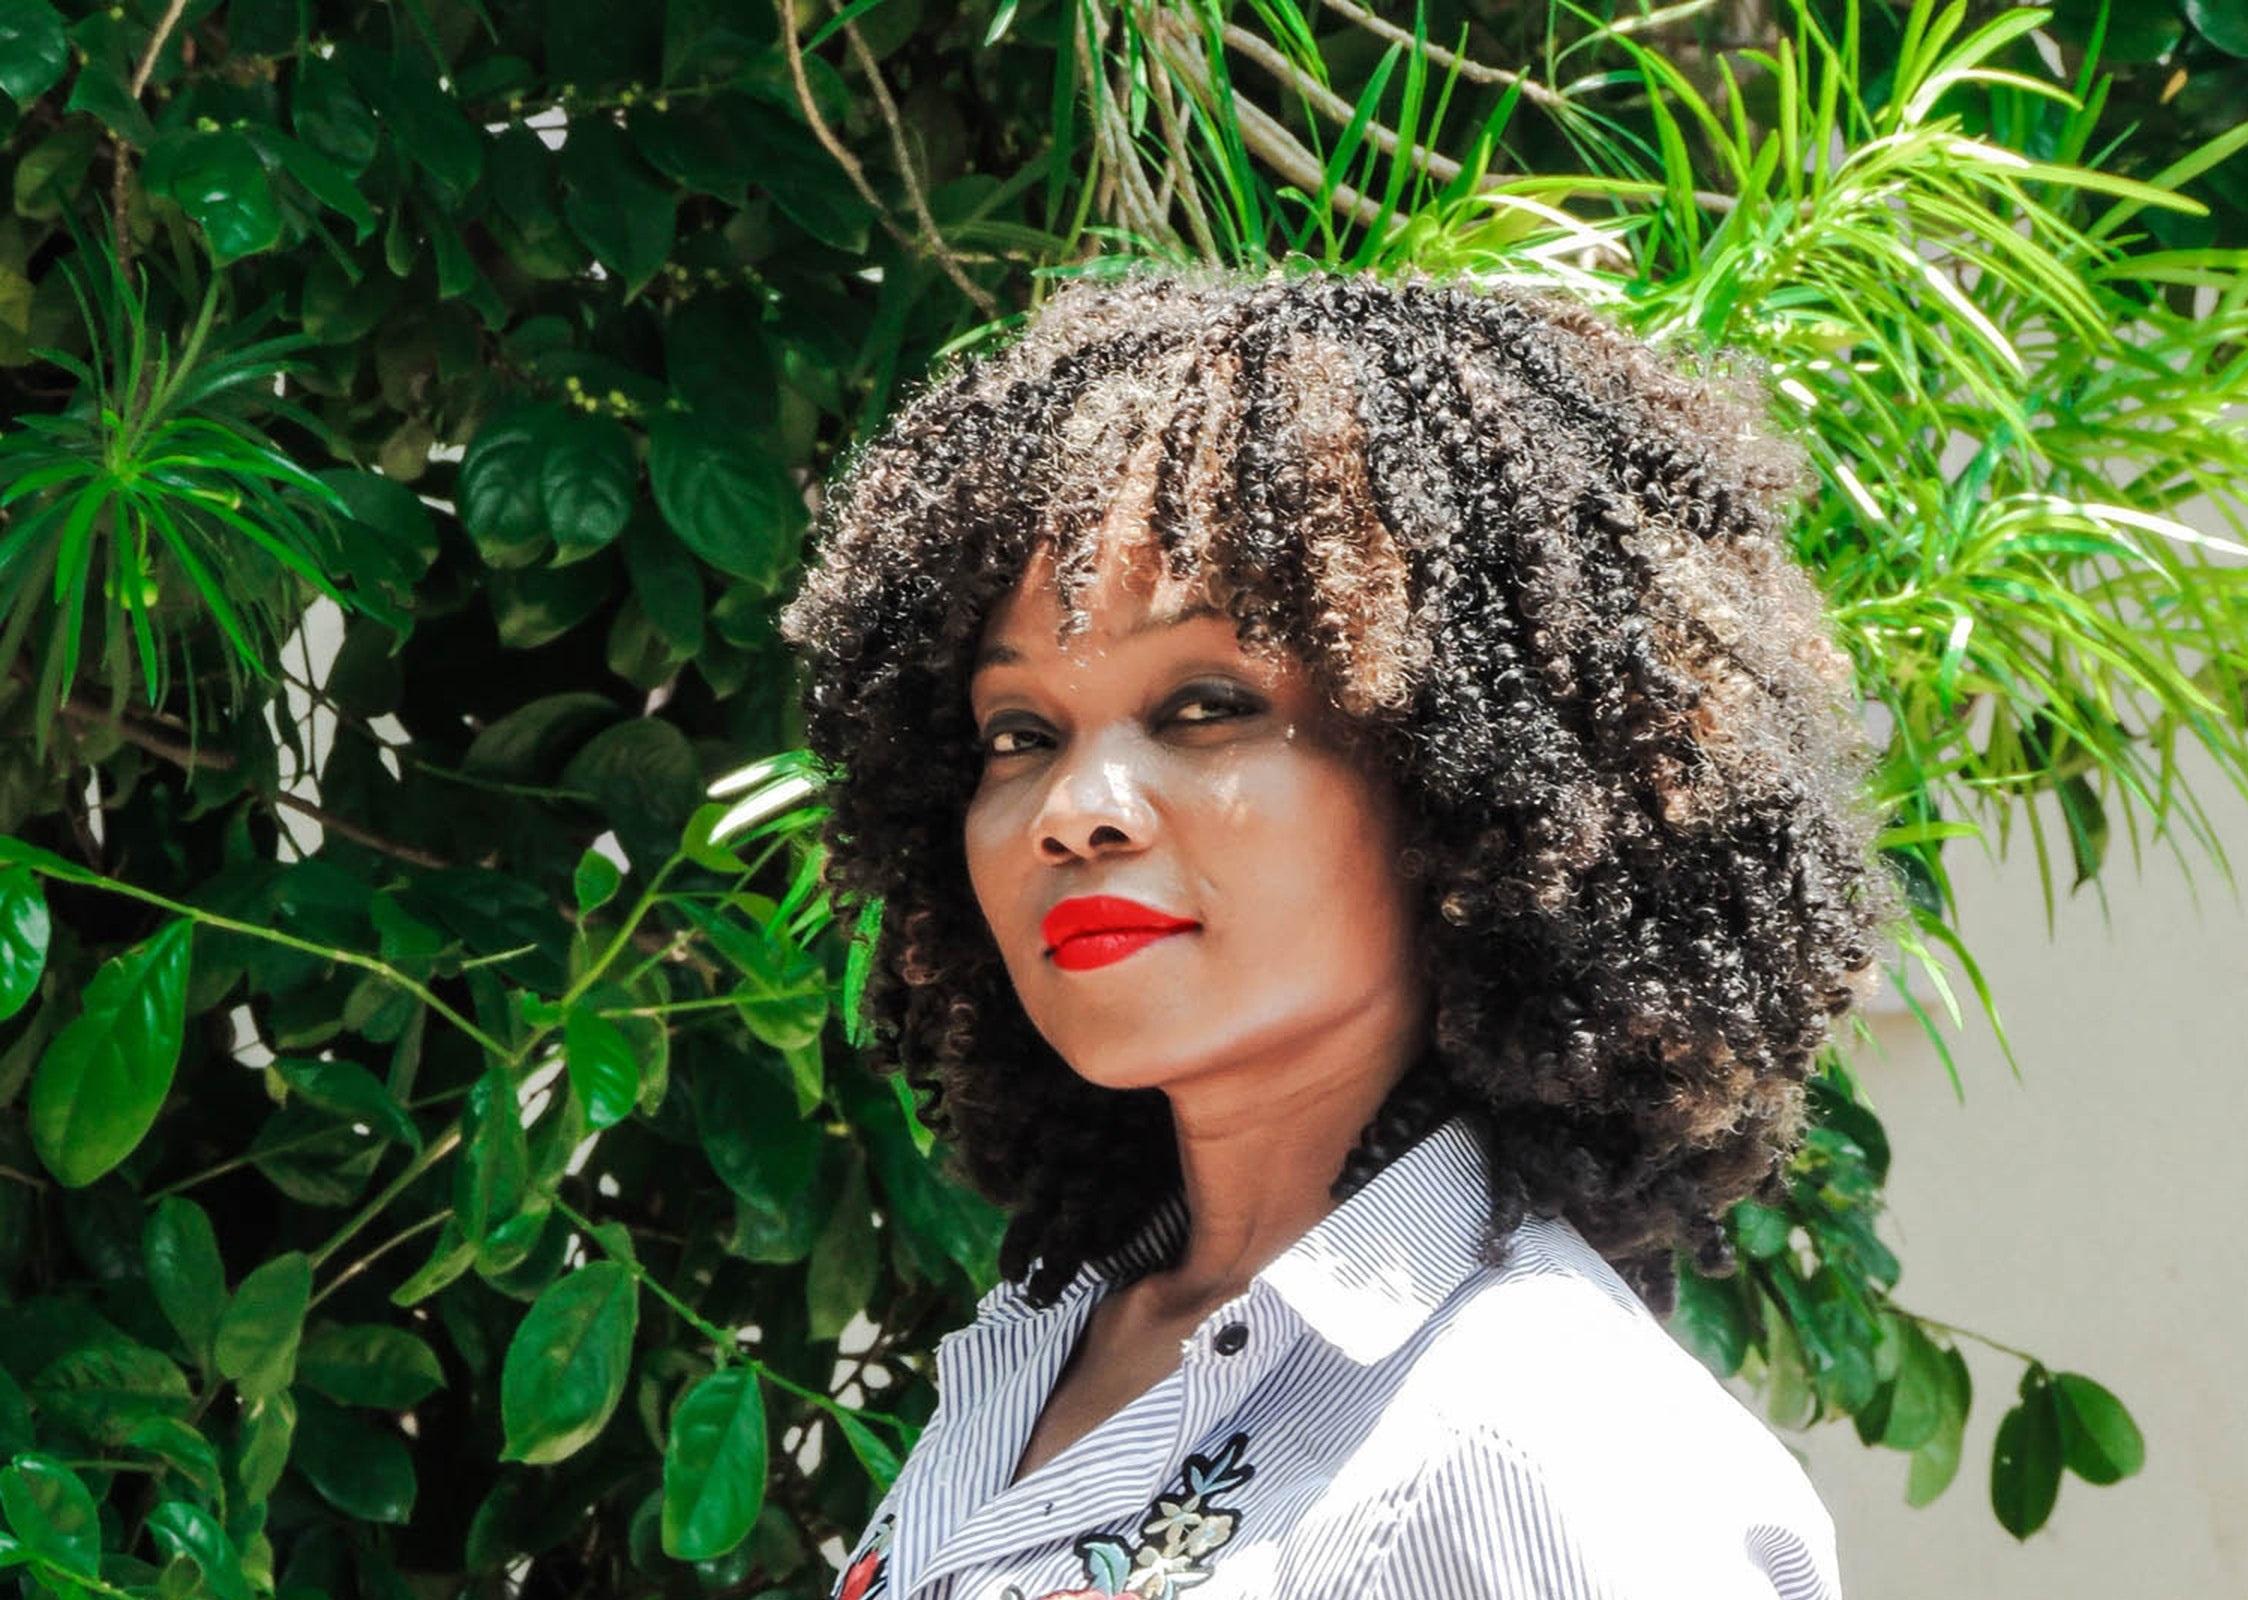 cortes de cabelo feminino medio 3 - Cortes de cabelo feminino médio: dicas e ideias para todo tipo de fio